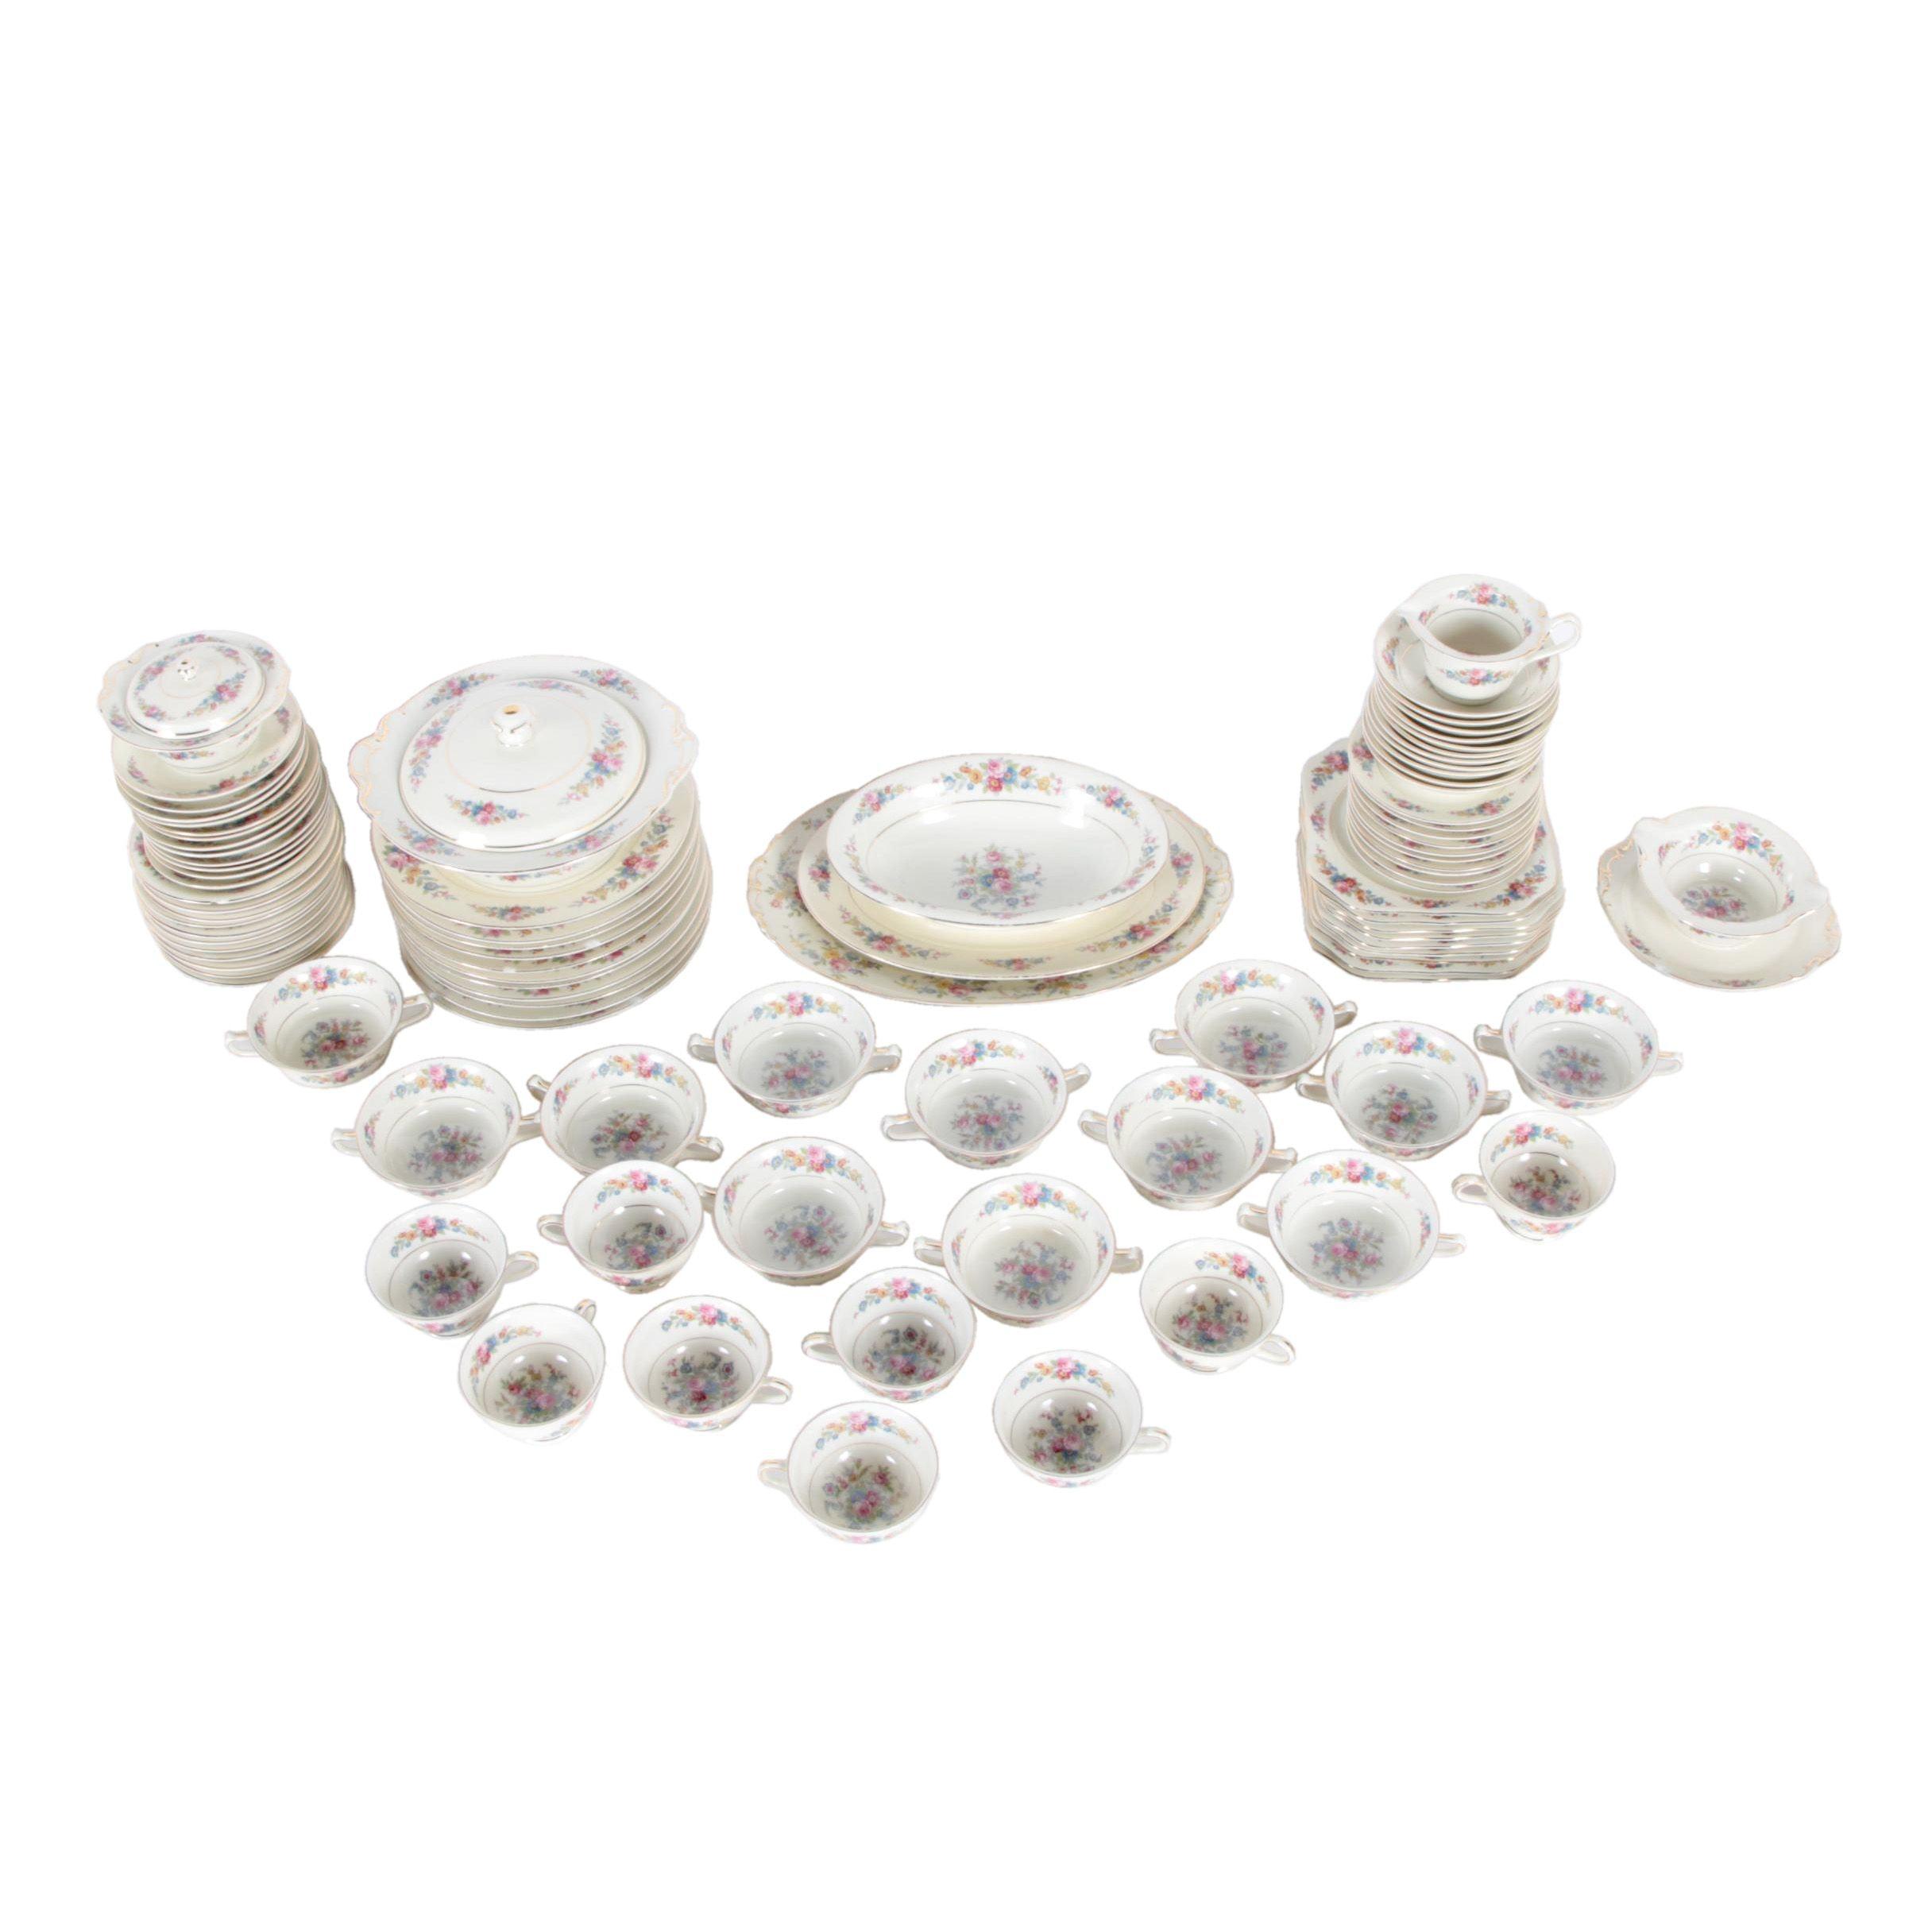 "KPM ""Royal Ivory"" German Porcelain Dinnerware 1934-45"